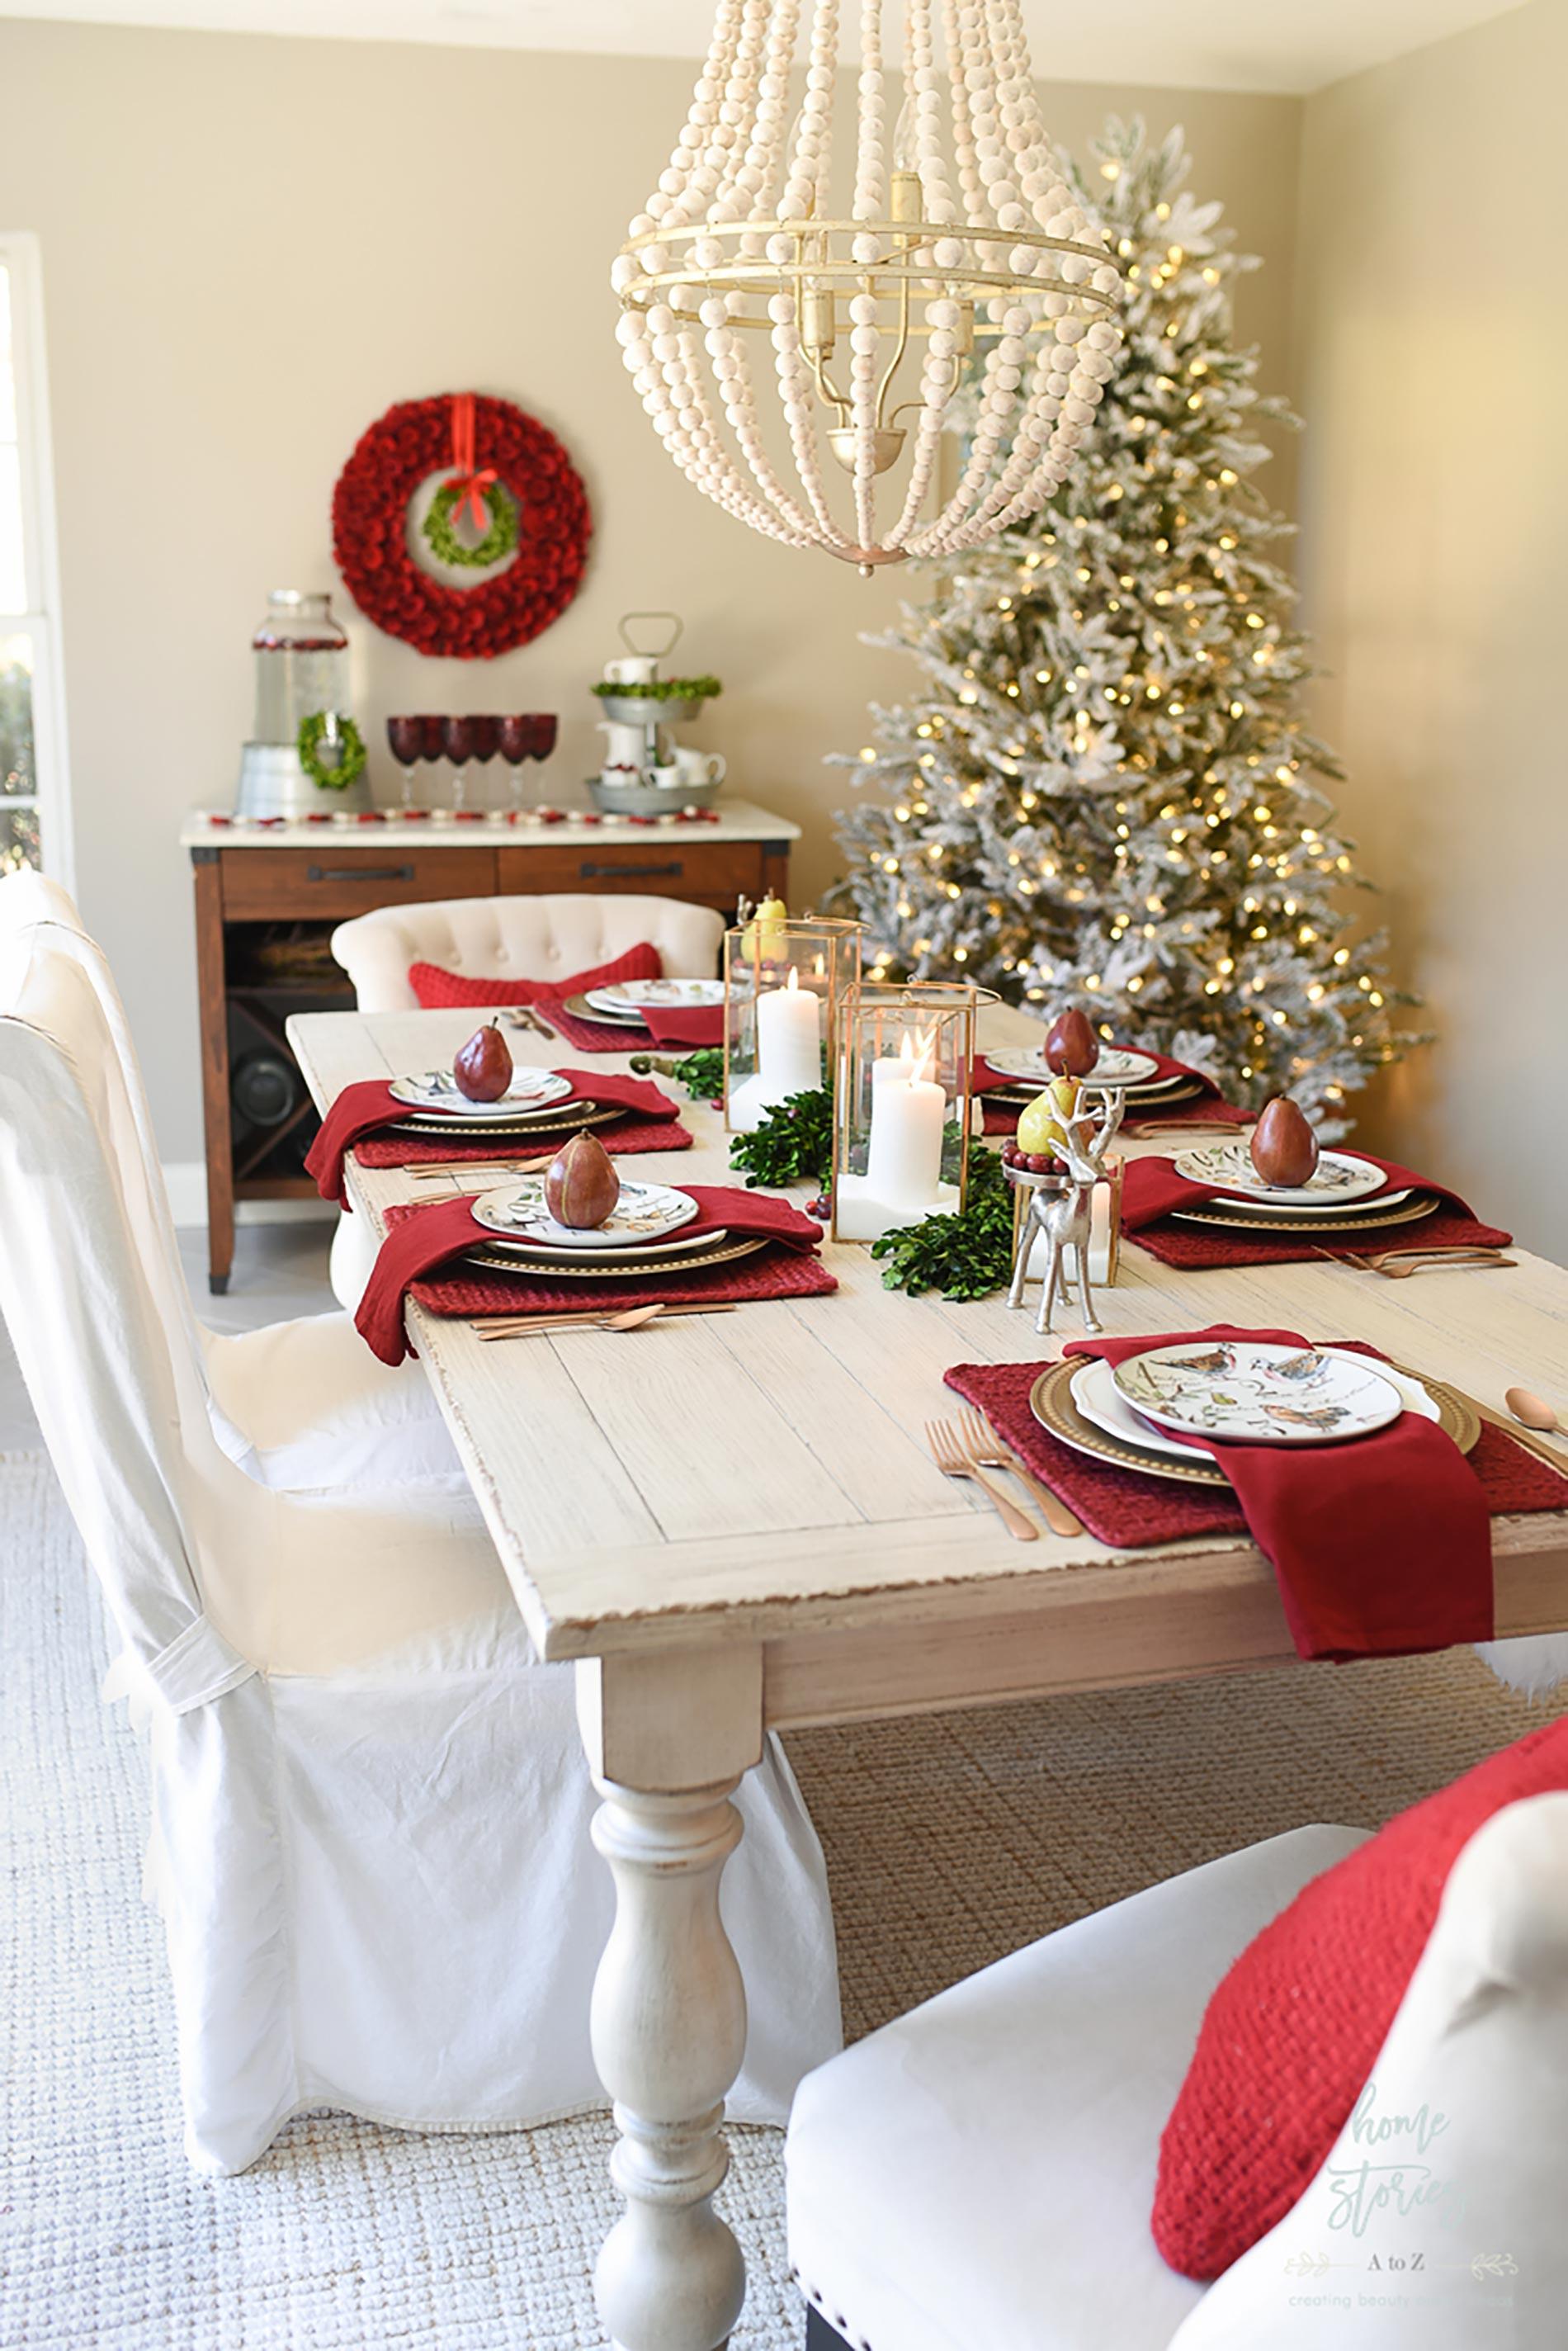 decorazioni natalizie americane sala da pranzo